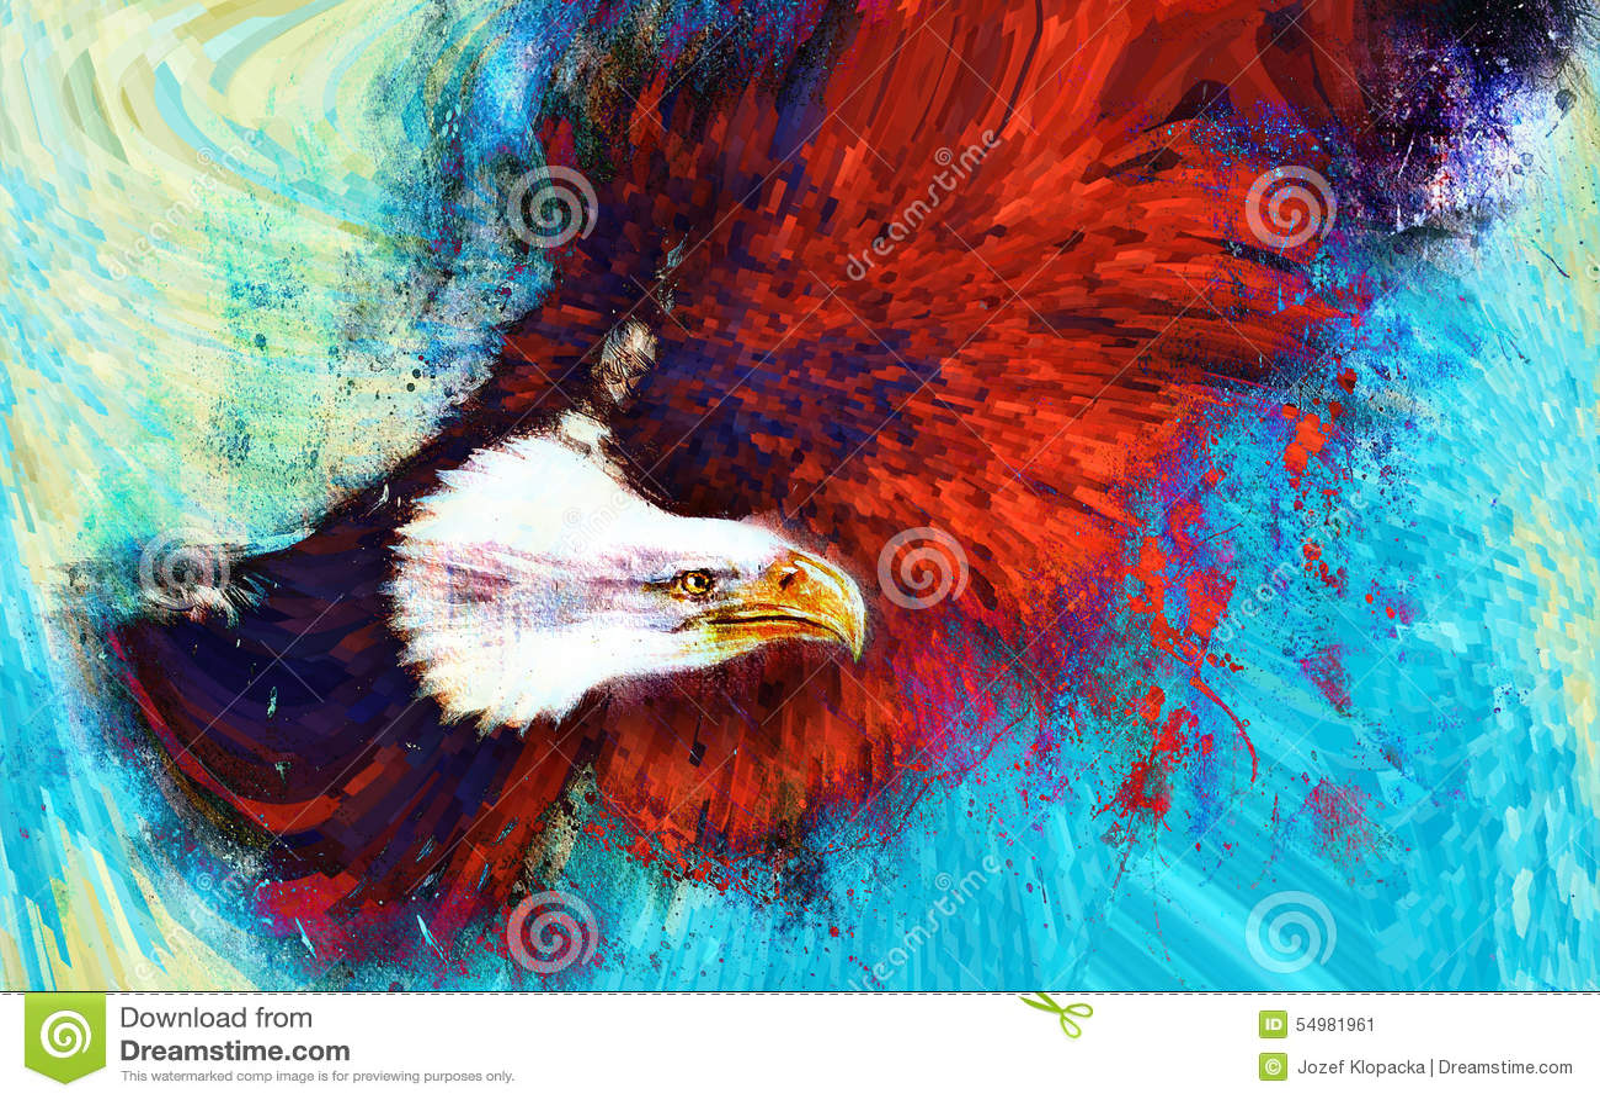 Fond et oiseau abstraits